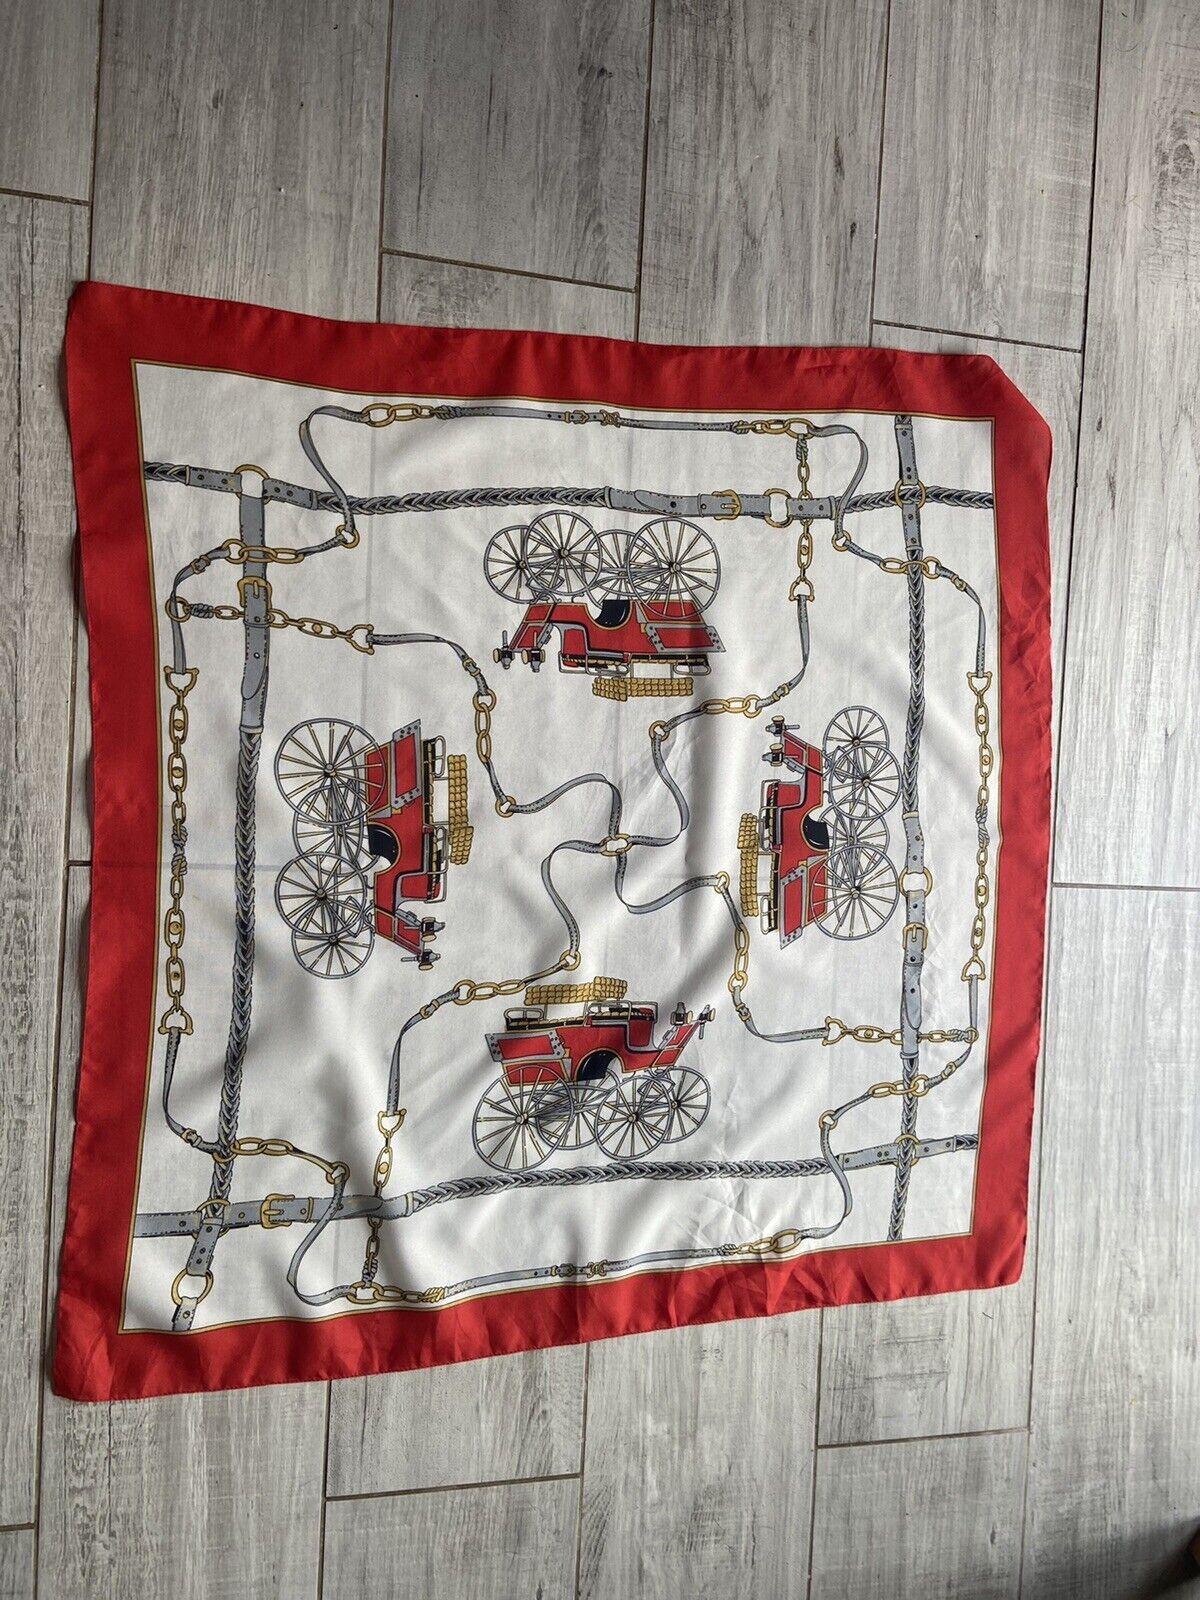 VINTAGE 70's RED & WHITE EQUESTRIAN PRINT RETRO SCARF